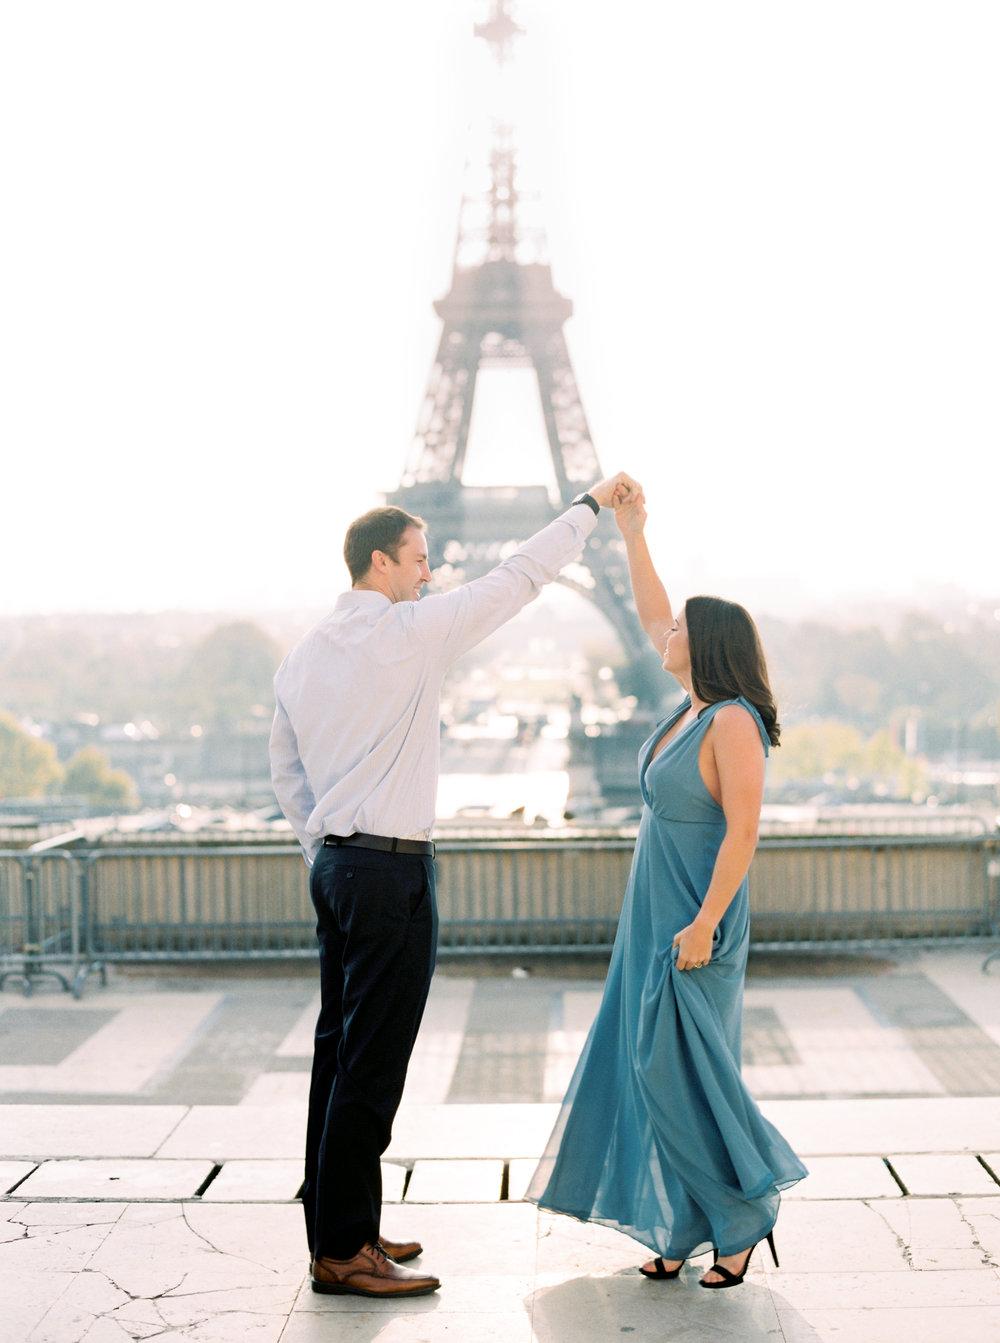 paris-france-wedding-photographer-destination-photographer-81.jpg